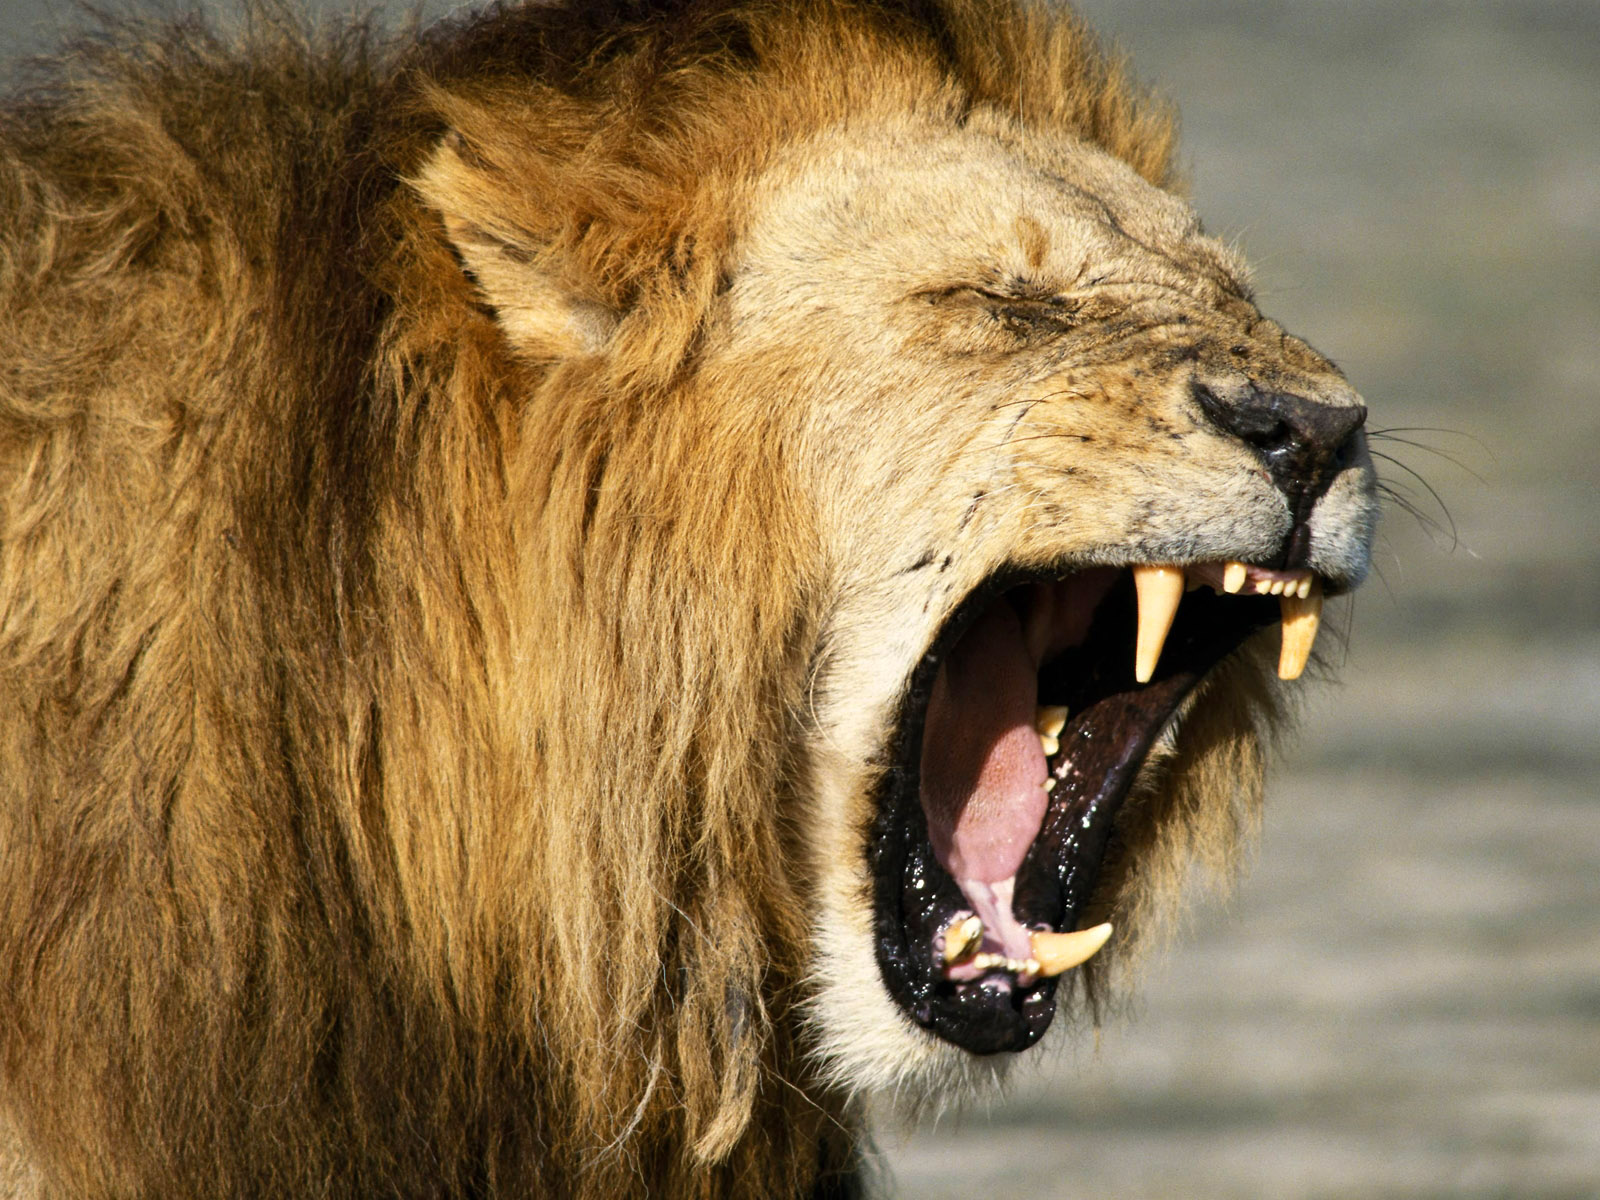 Koleksi Sketsa Gambar Kepala Singa Mengaung Terbaru